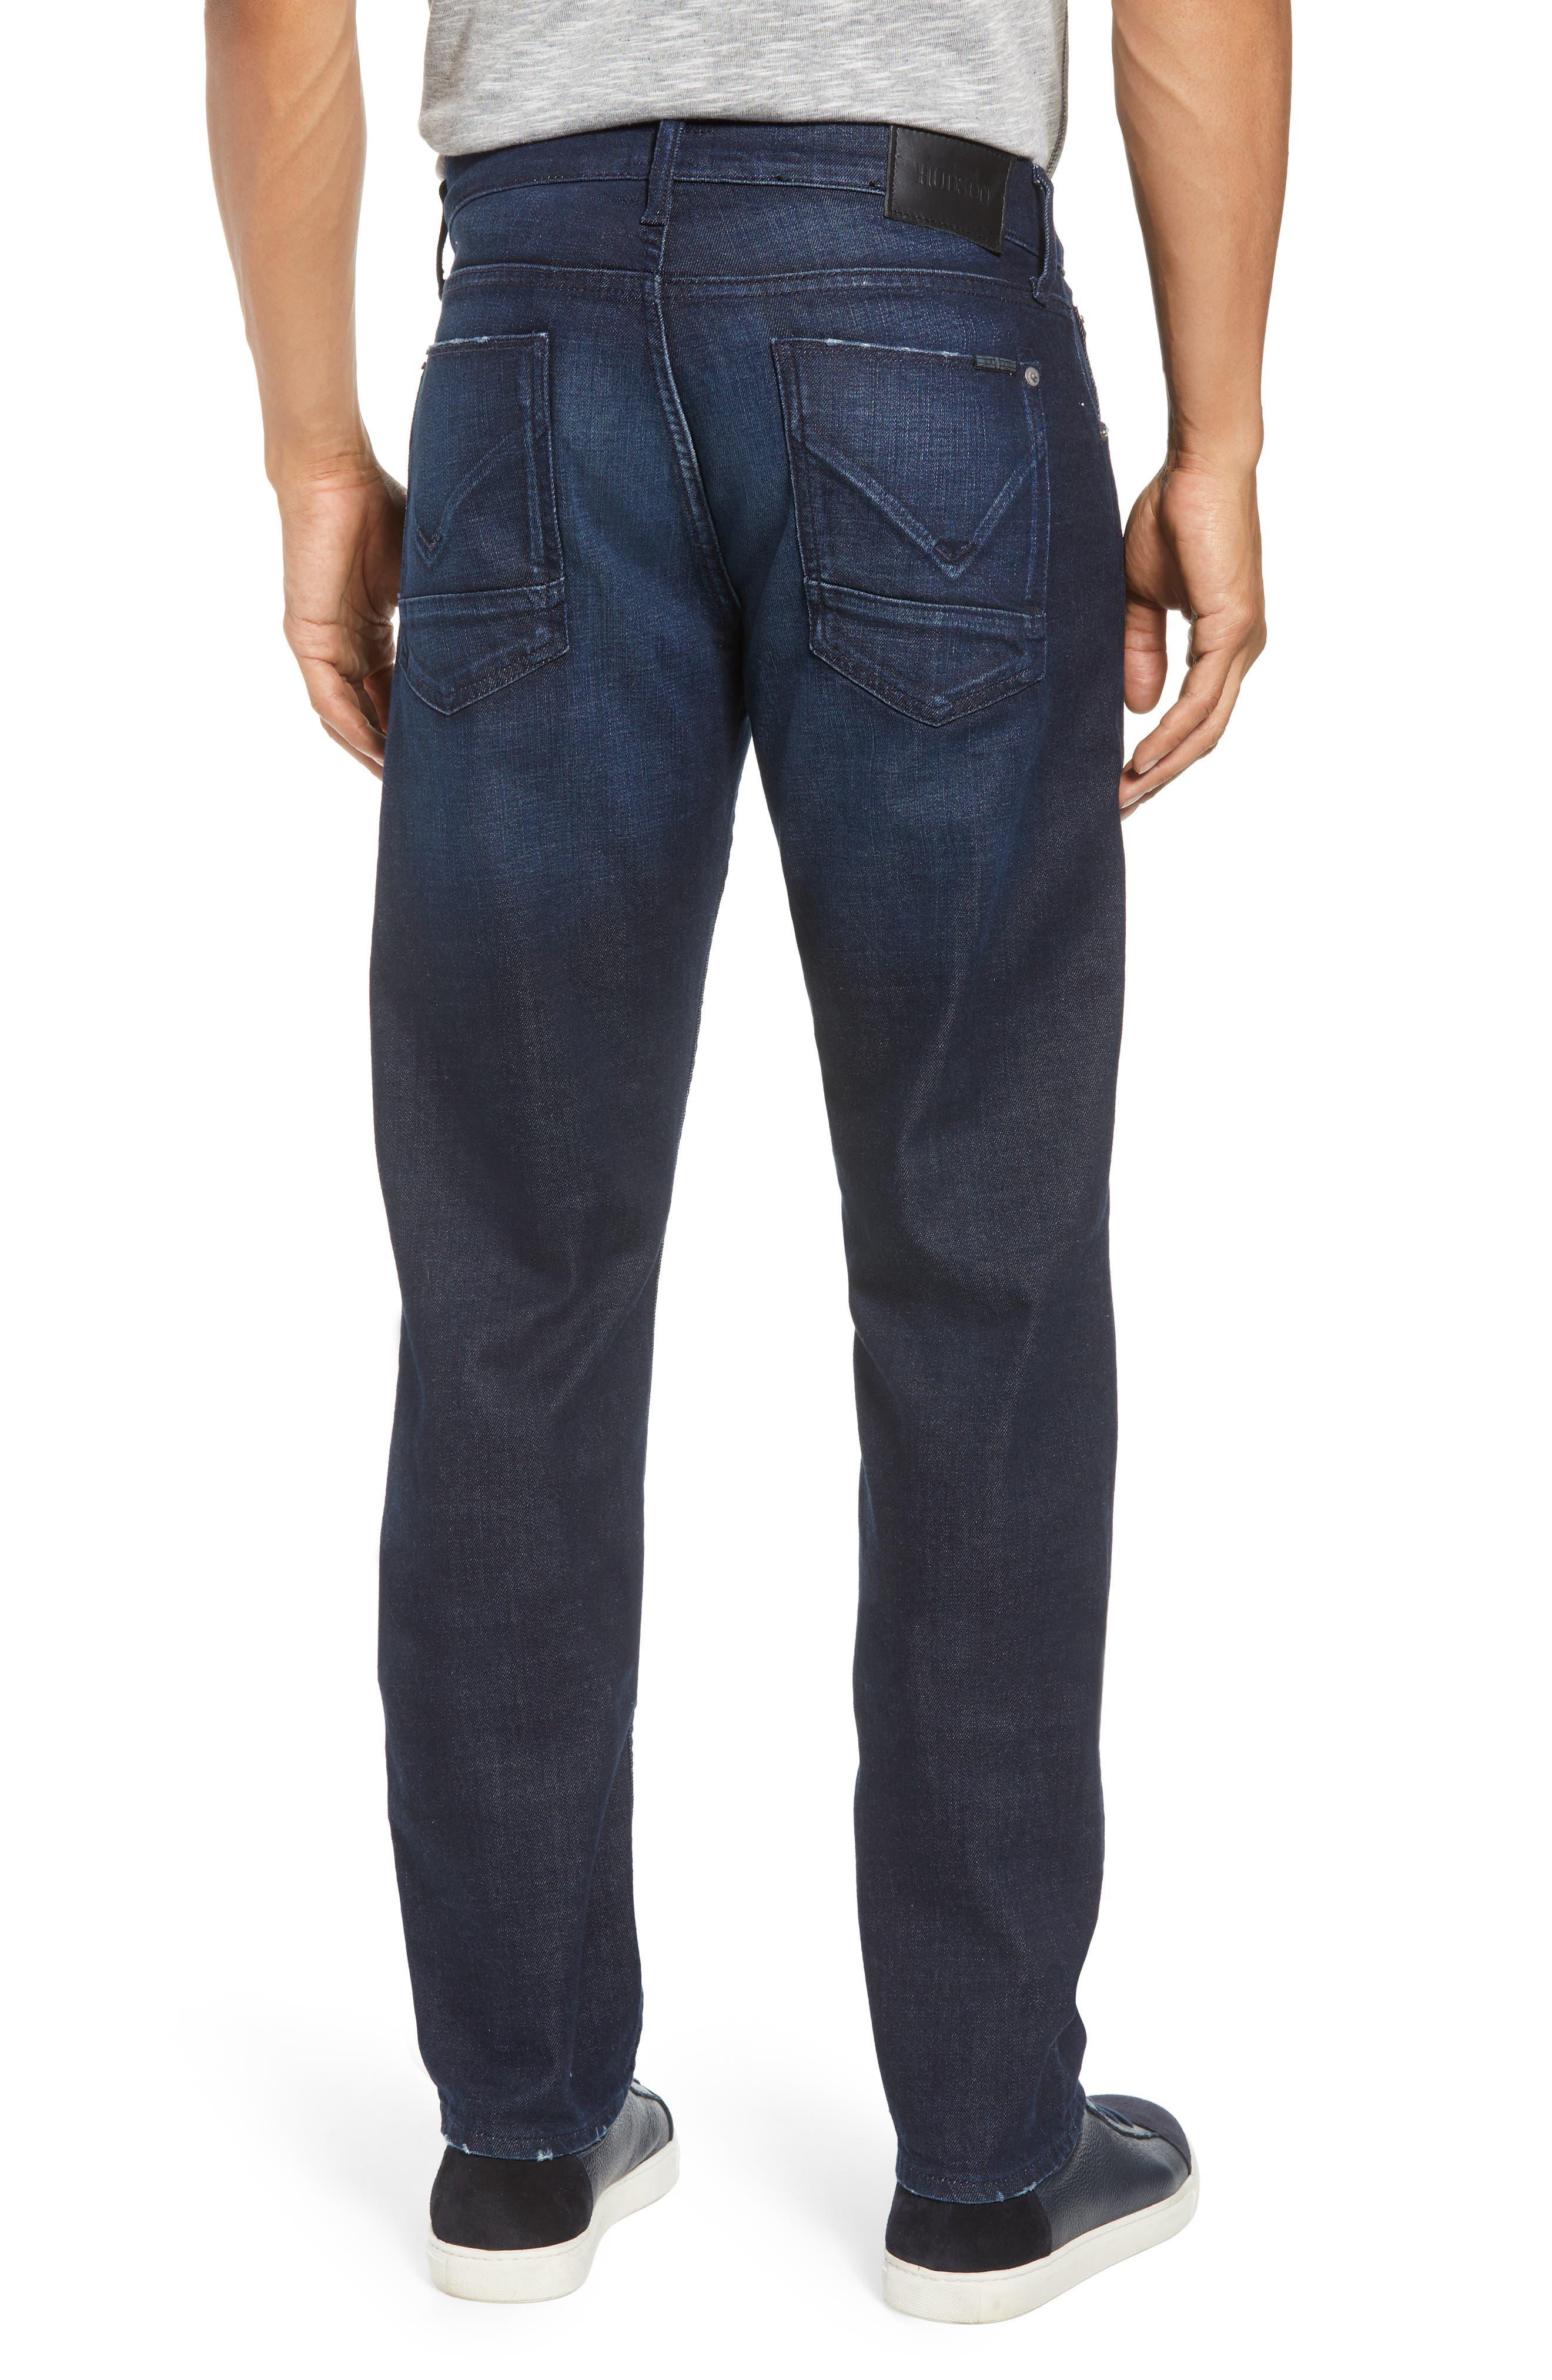 Blake Slim Fit Jeans,                             Alternate thumbnail 2, color,                             BARRY